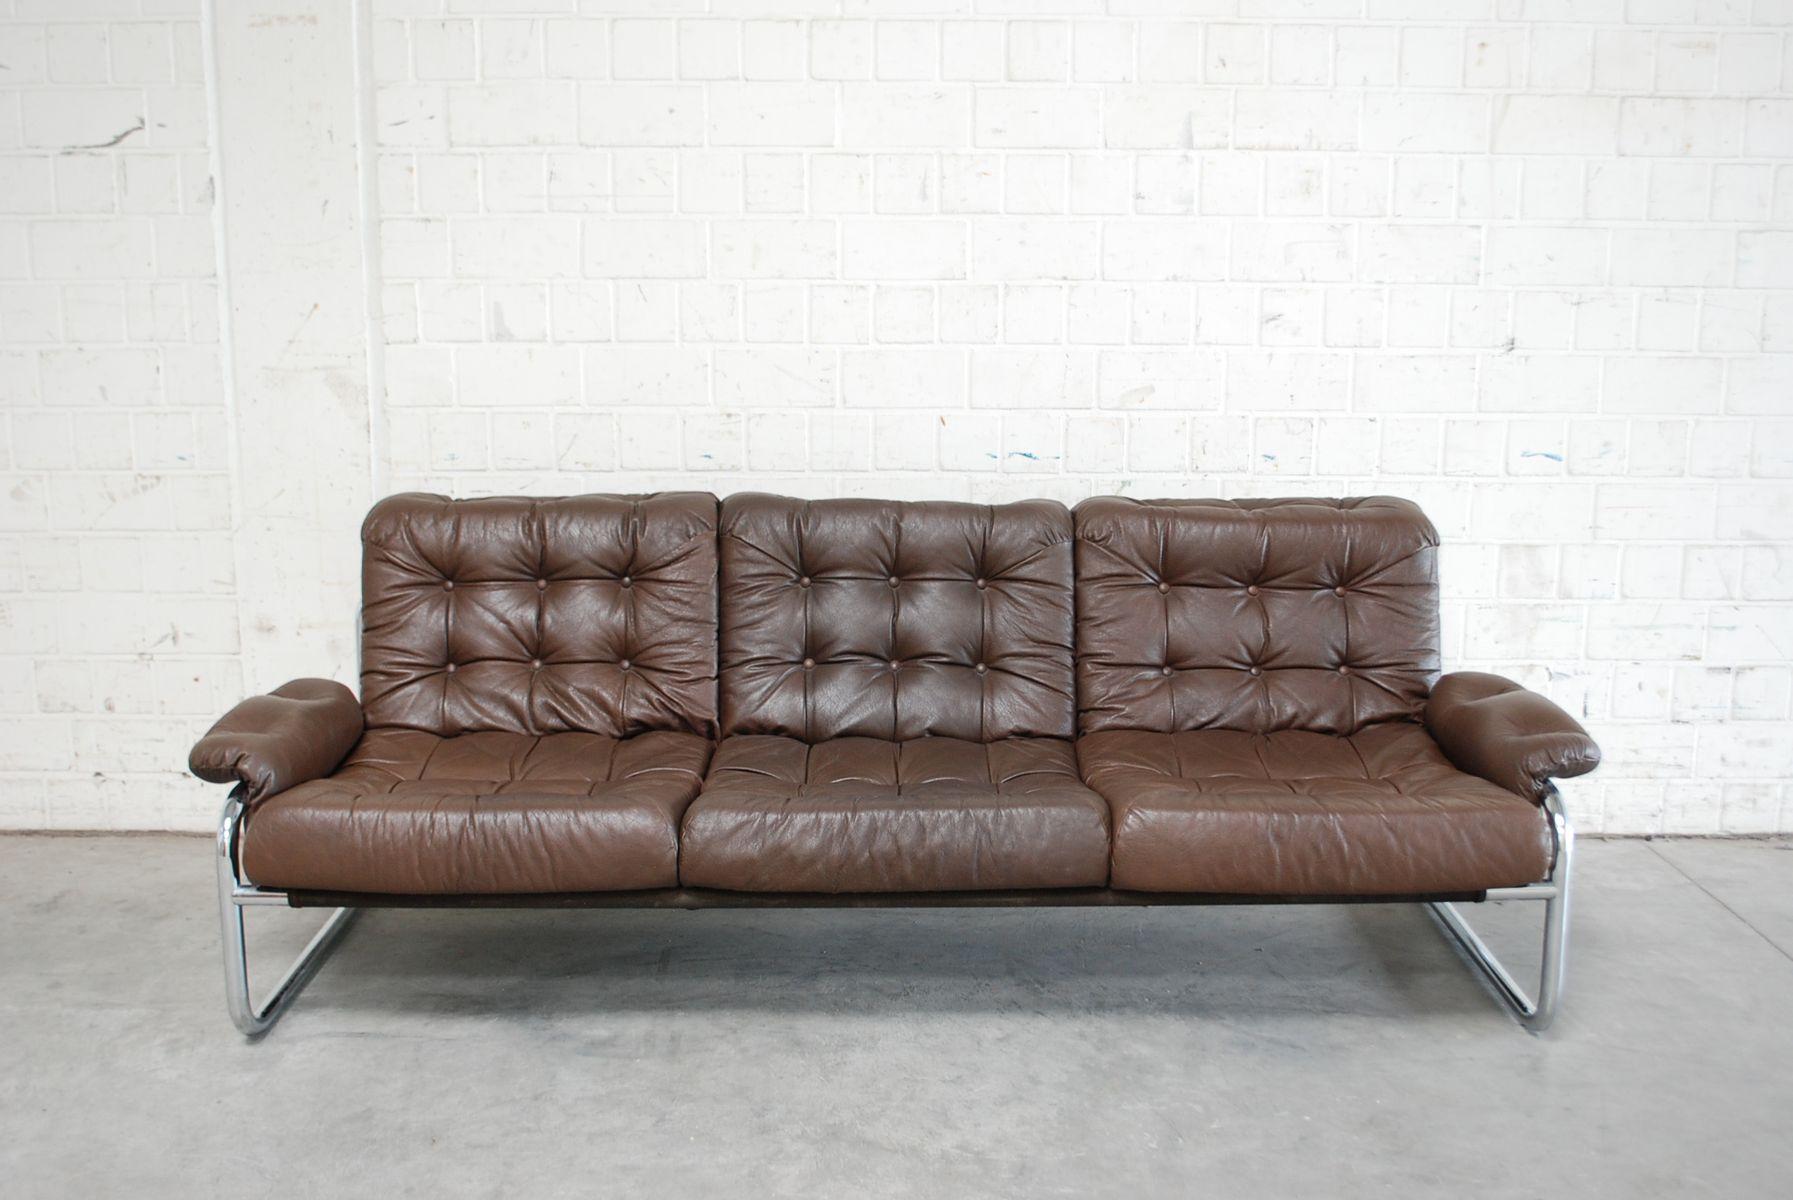 Vintage Leather U0026 Chrome Sofa From Ikea